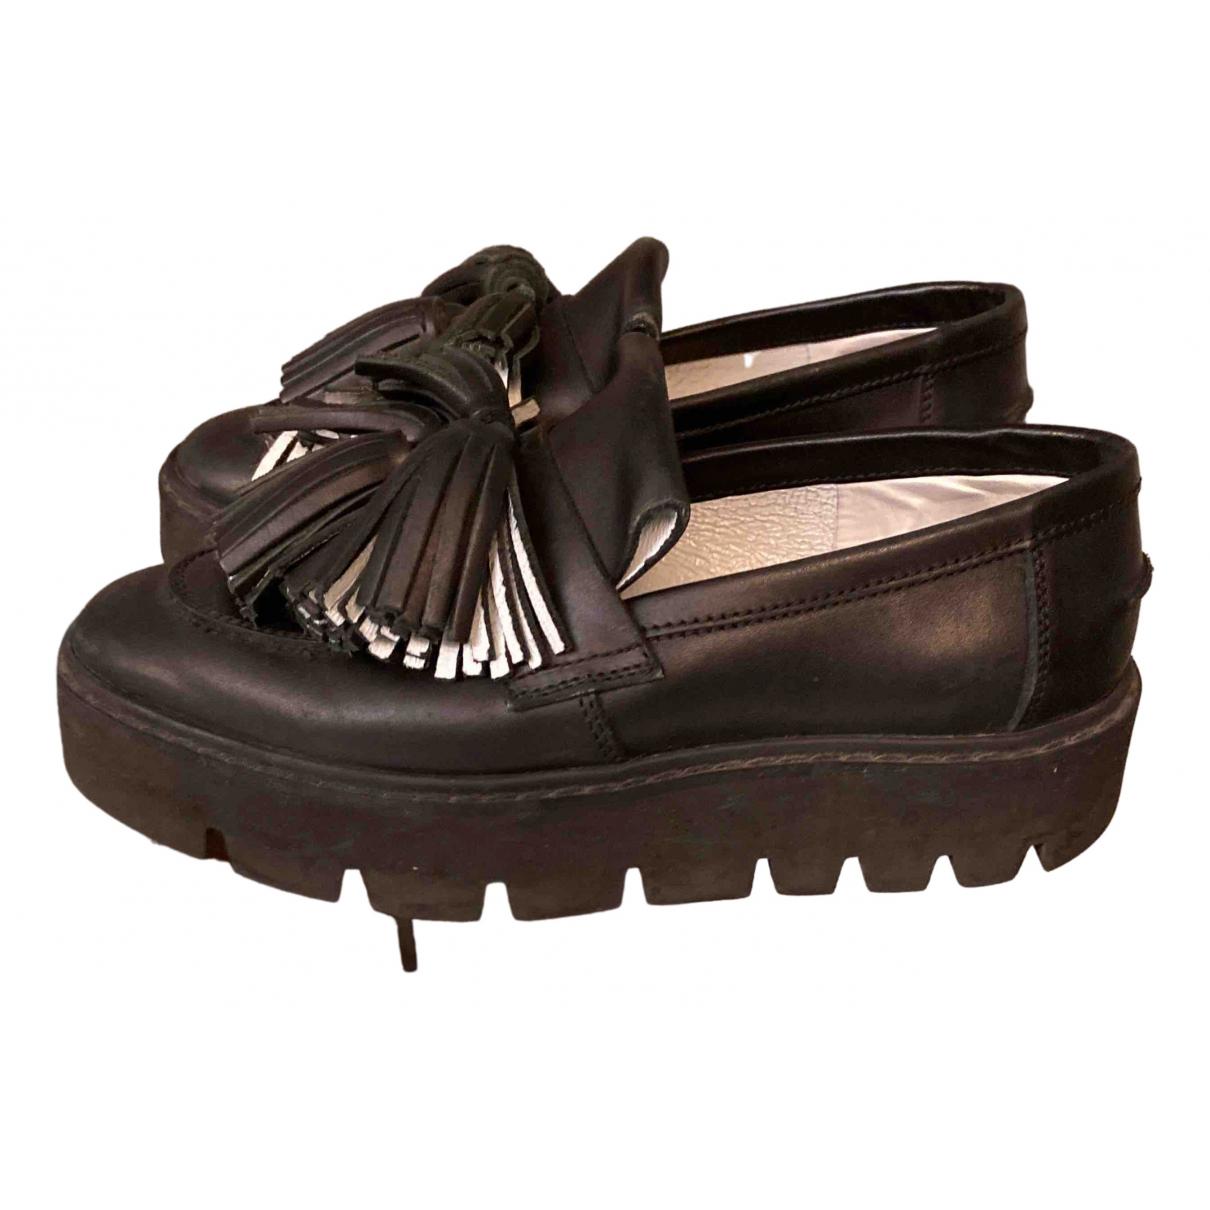 Maison Martin Margiela \N Black Leather Flats for Women 37 EU